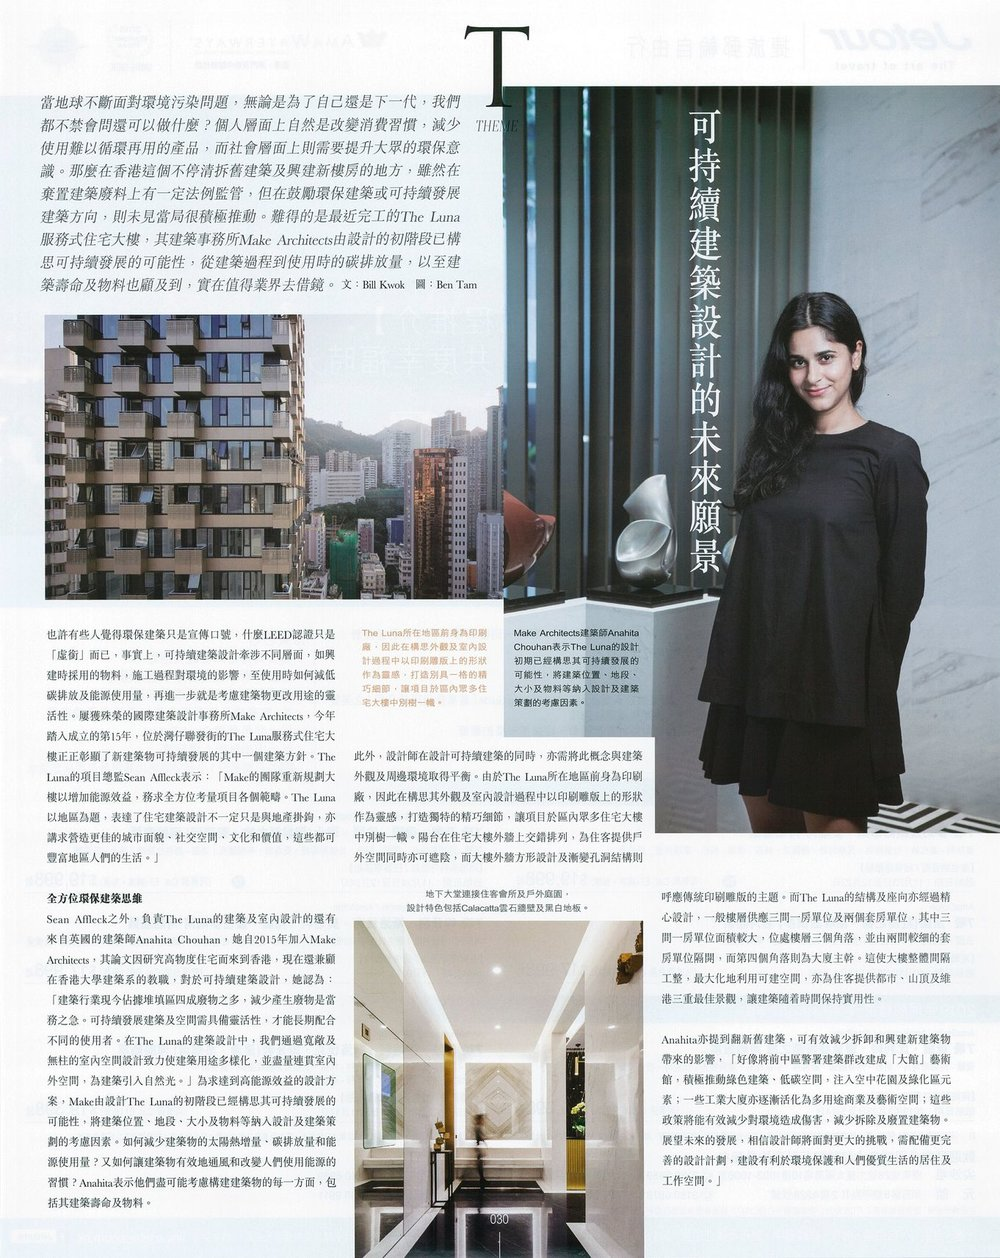 MAKE_TheLuna_LifestyleJournal_ Anahita Chouhan Architect Designer Hong Kong 10Sep2018_1.jpg